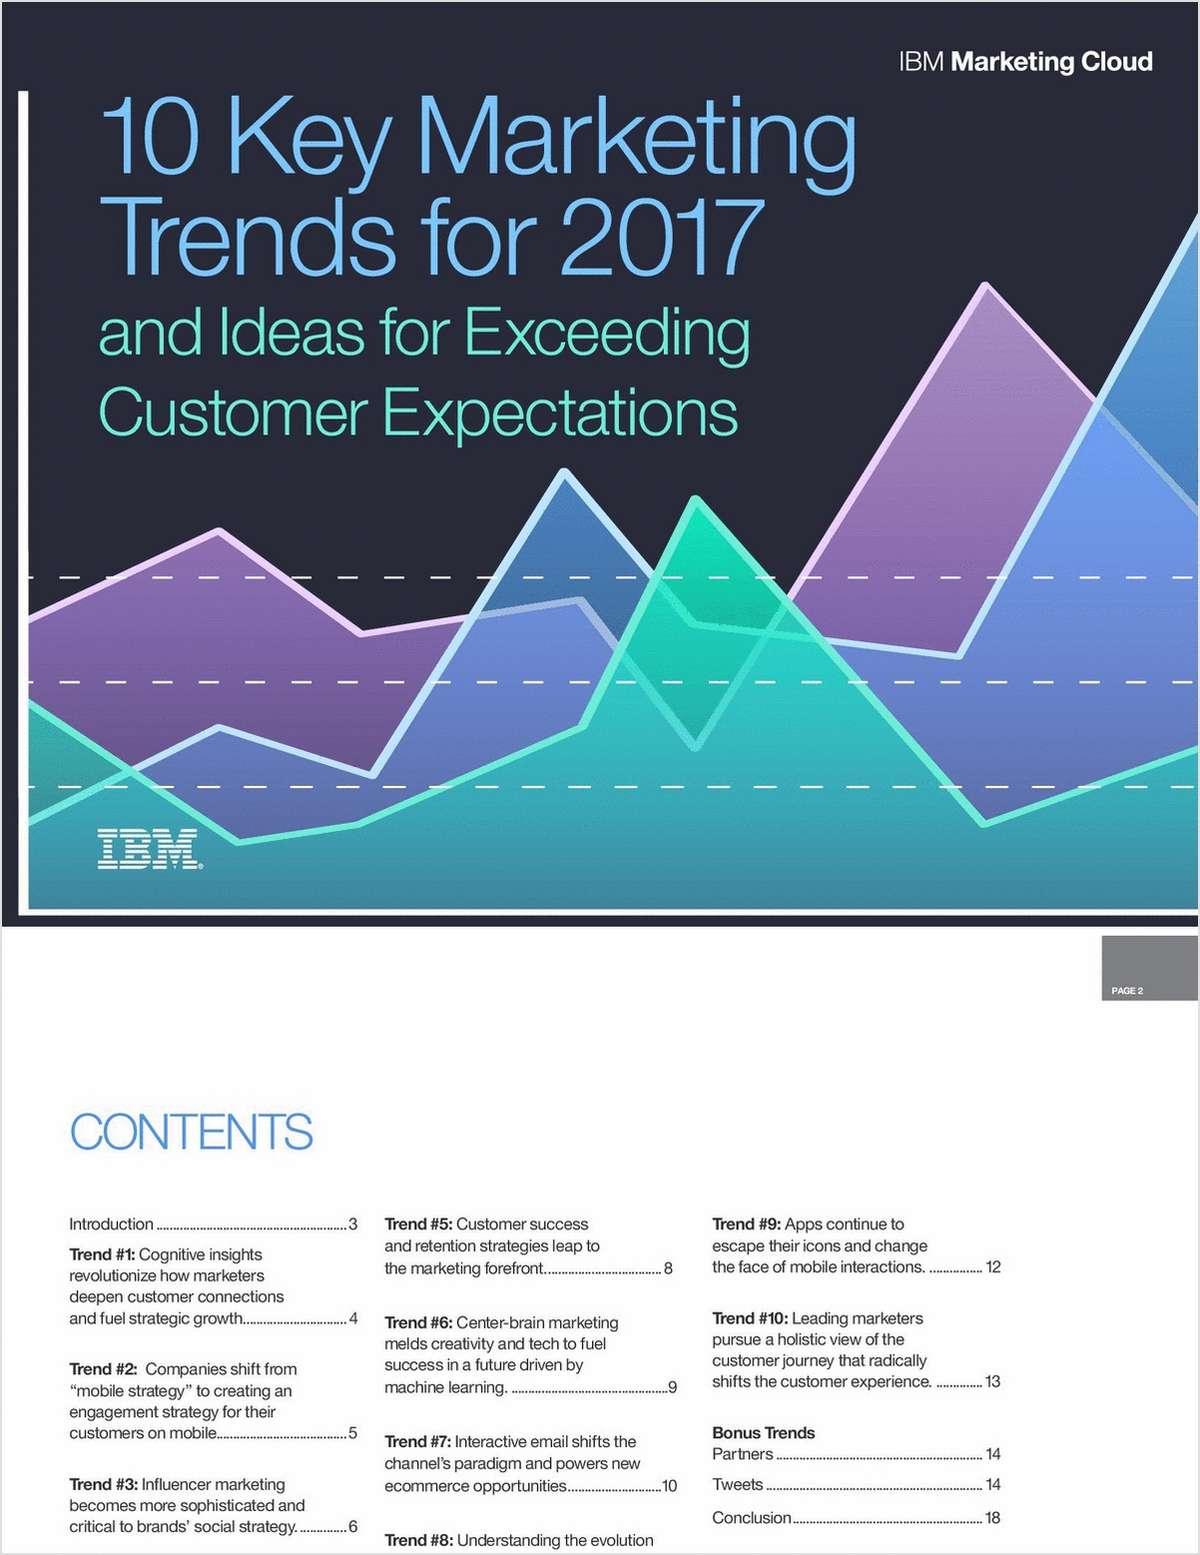 http://magz.tradepub.com/free-offer/10-key-marketing-trends-for-2016/w_silc35?sr=hicat&_t=hicat:1211